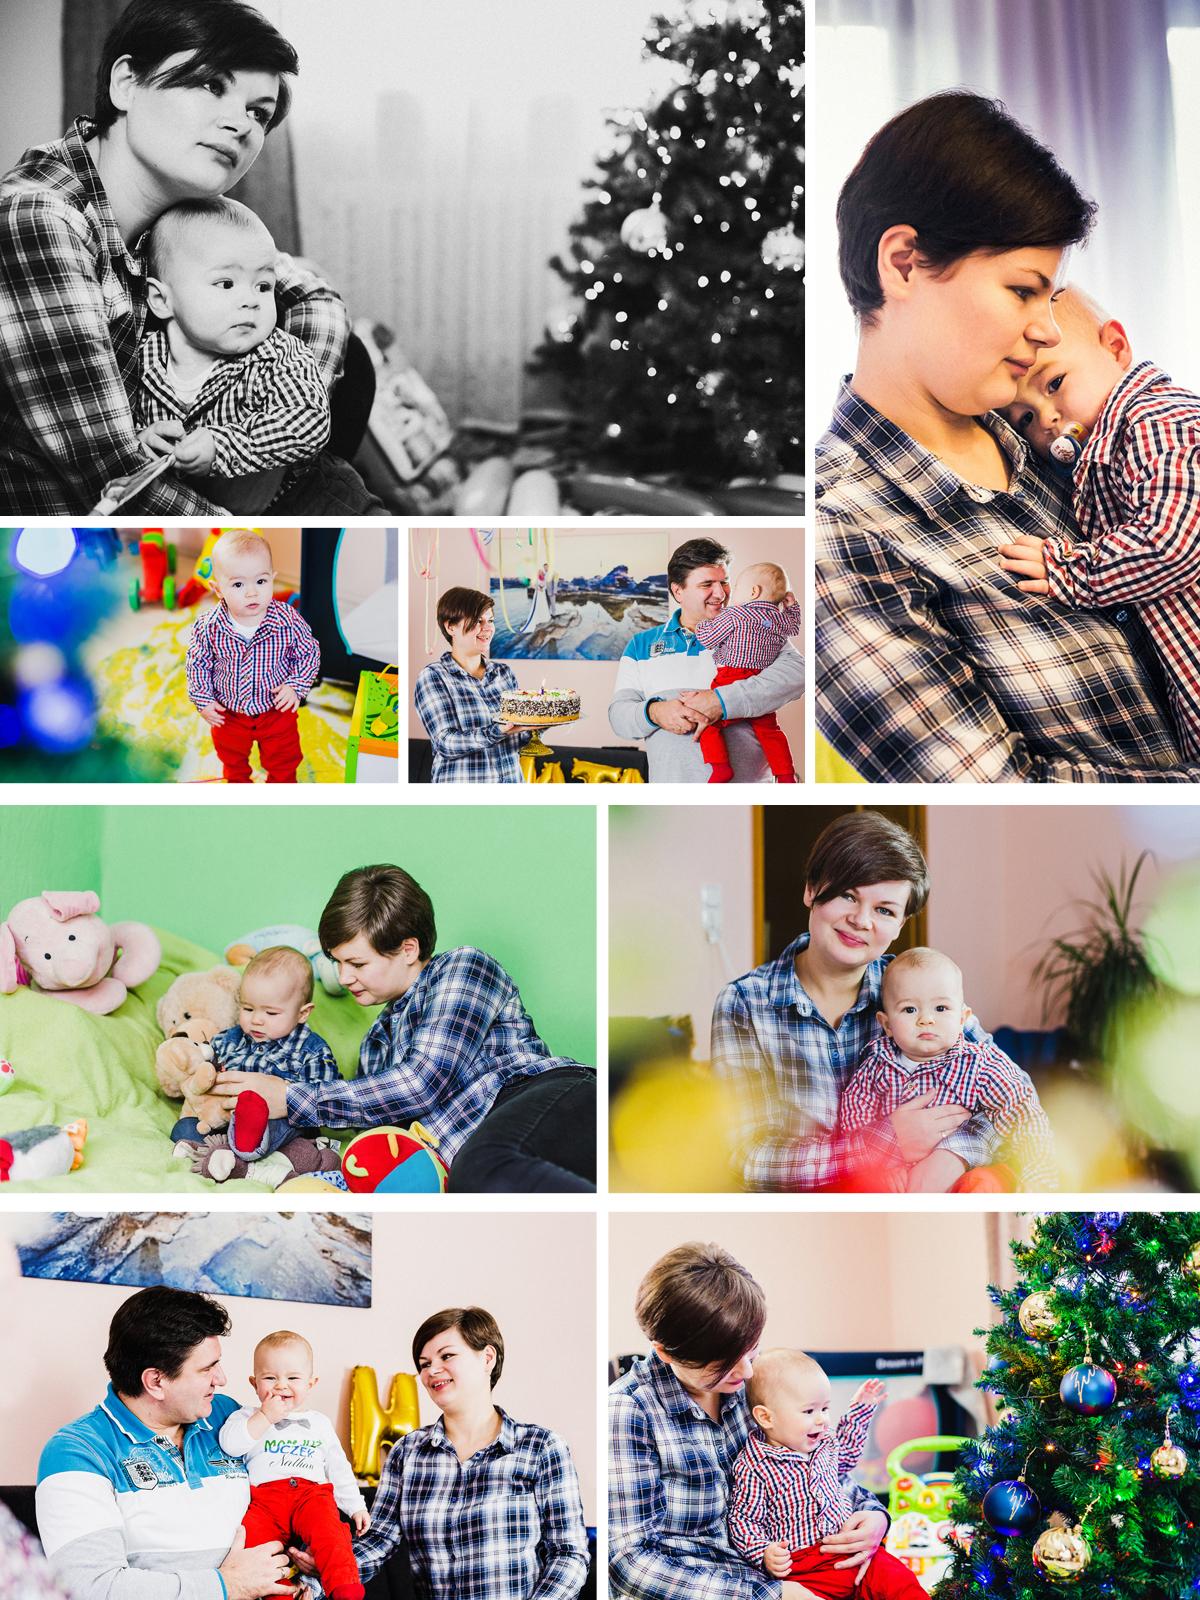 rodgau fotostudio, famileinshooting, familienbilder, fotoshooting hessen, gute fotograf, tolle fotos,